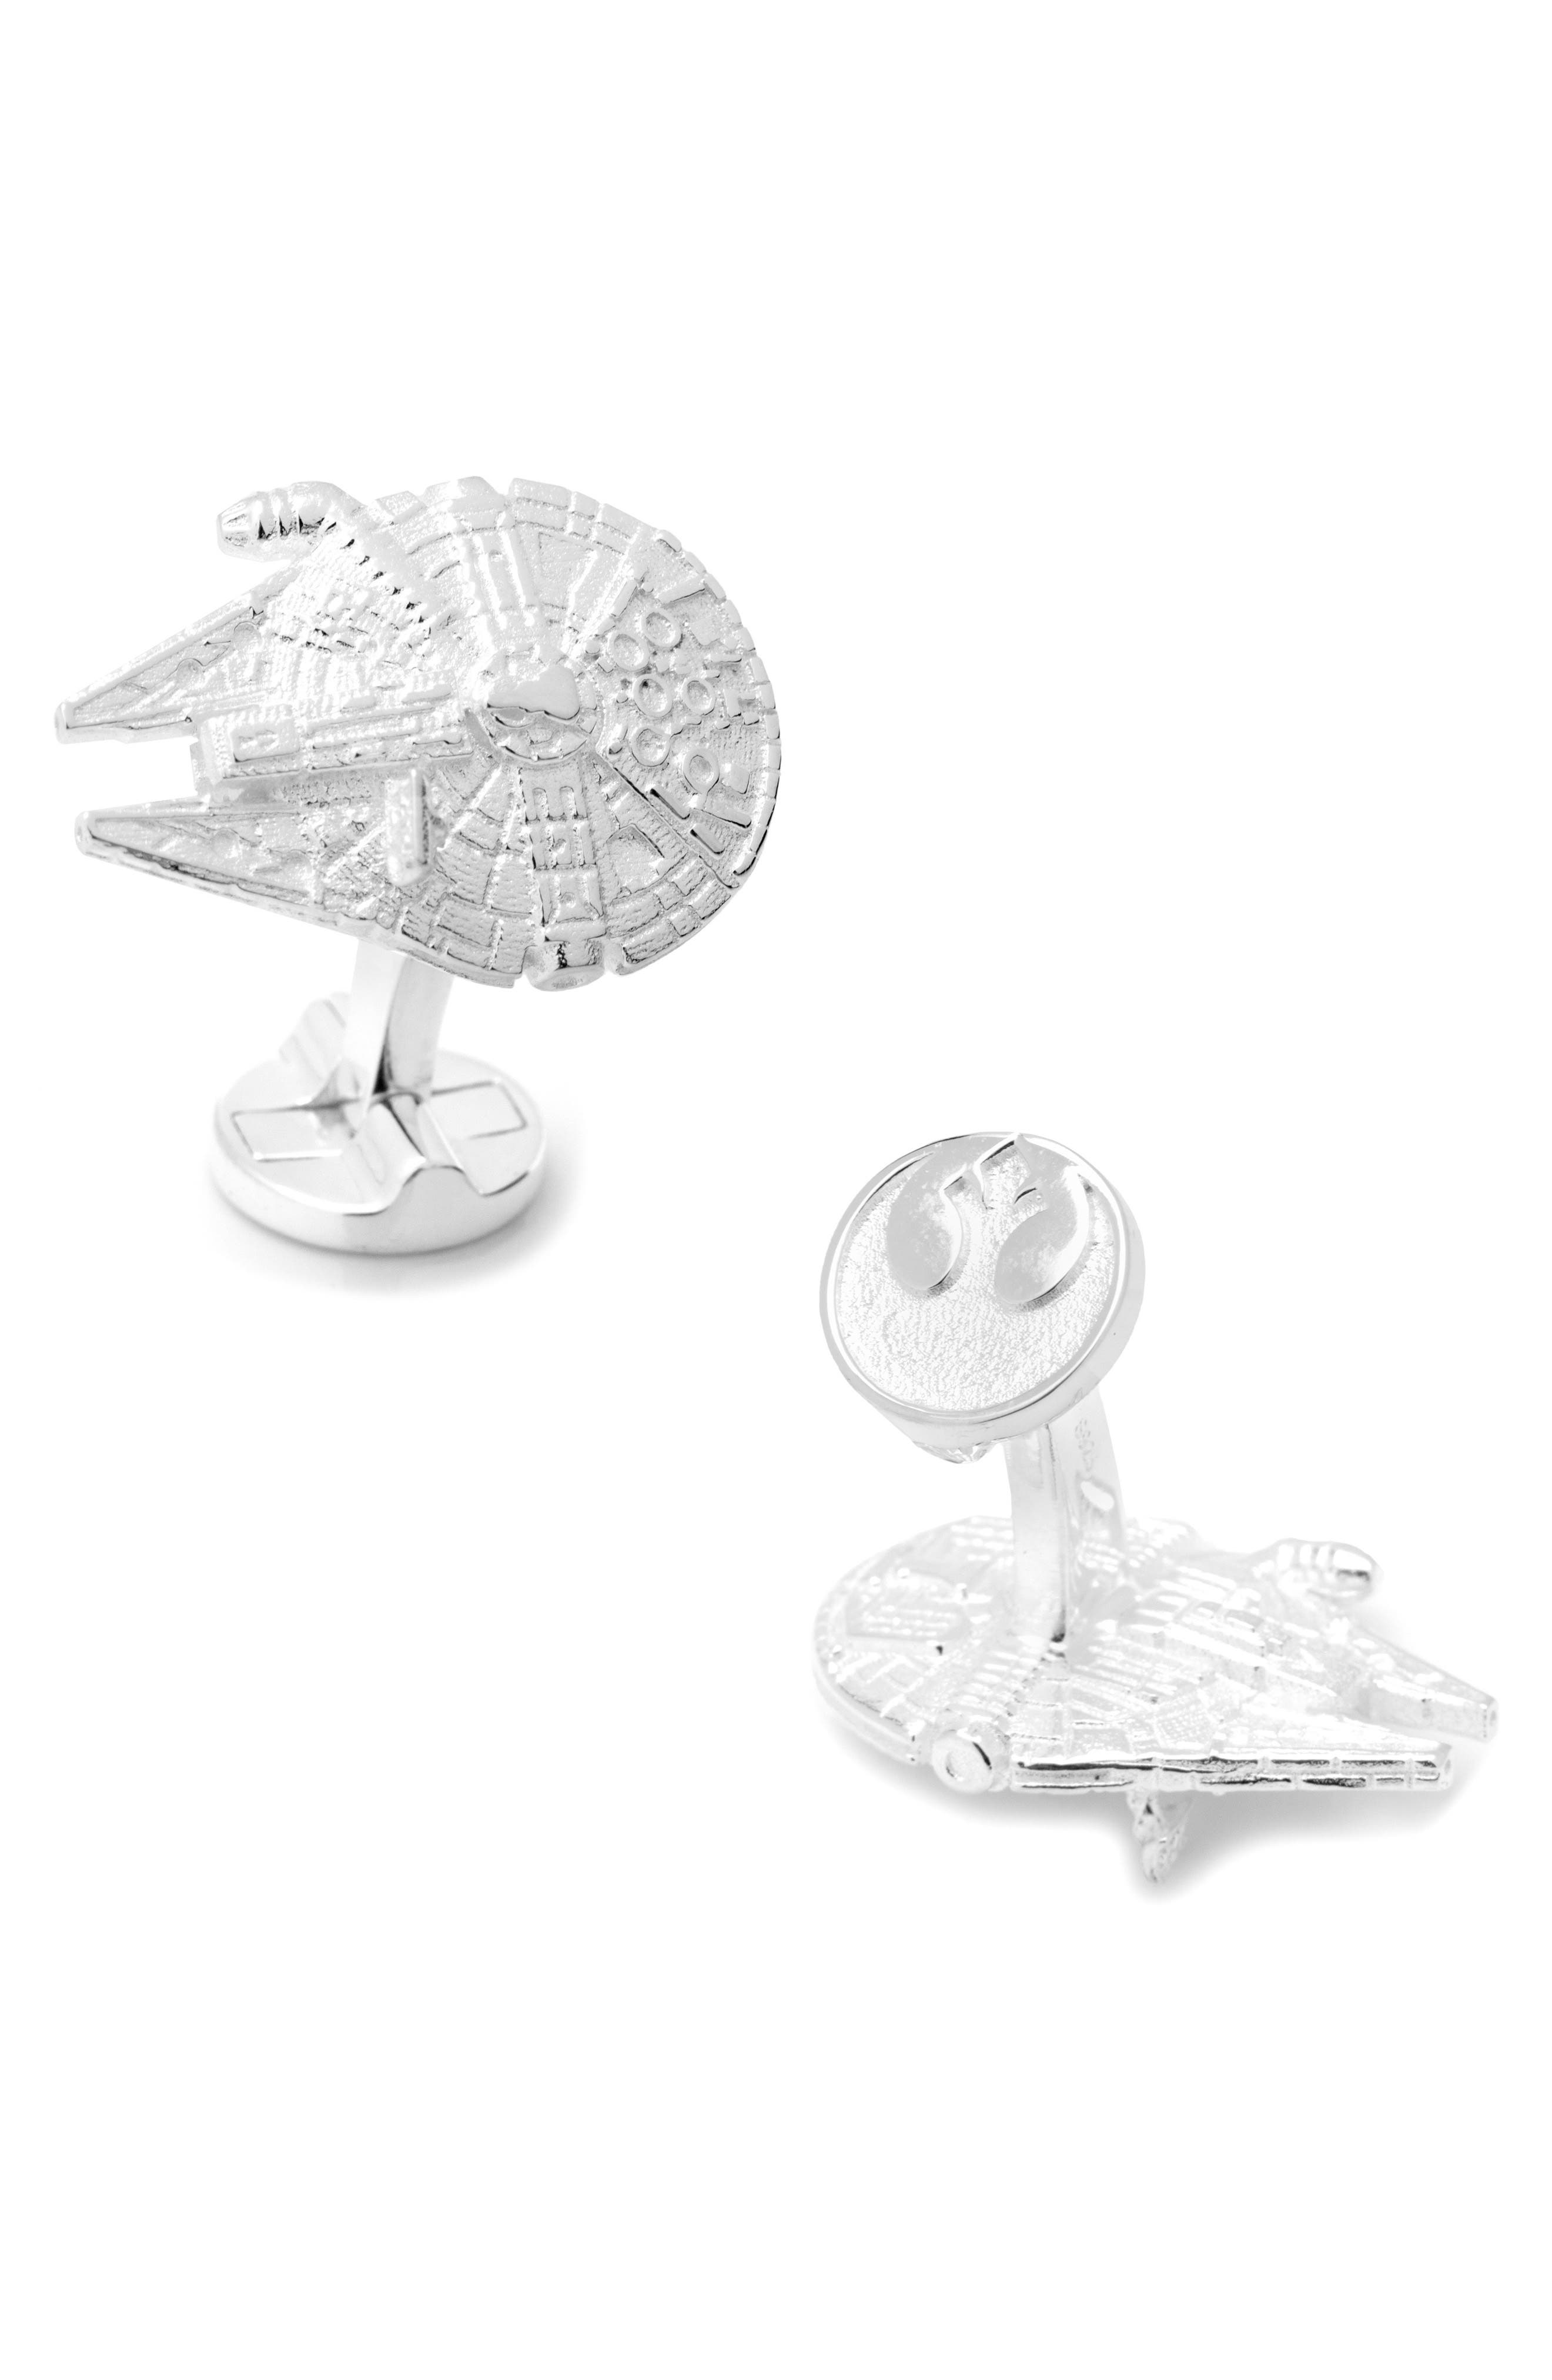 Star Wars<sup>™</sup> Millennium Falcon Cuff Links,                         Main,                         color, SILVER